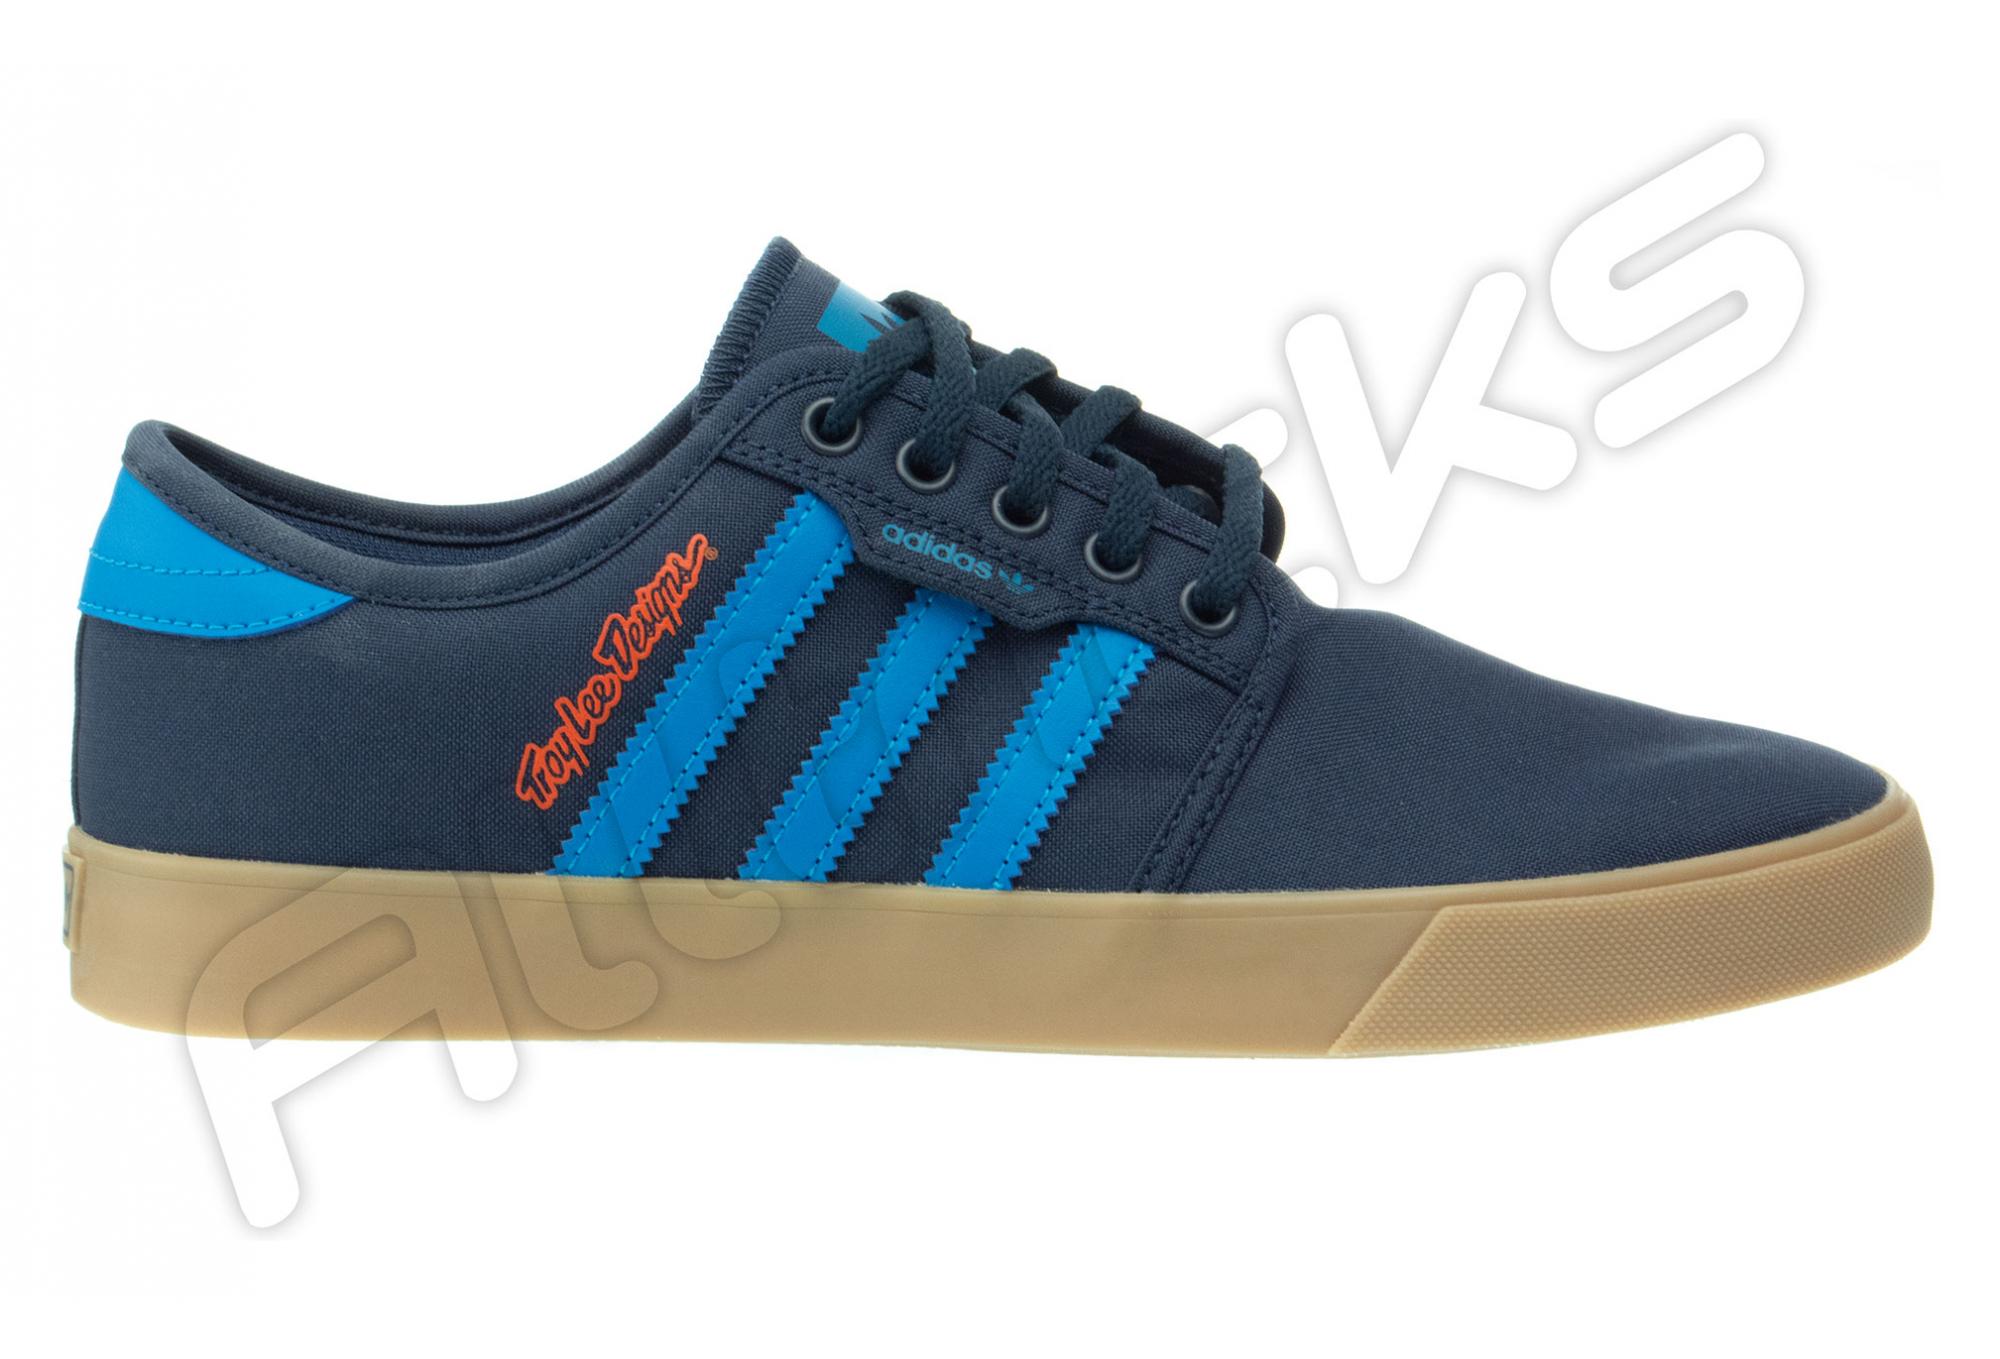 Chaussures Troy Lee Designs Seeley LTD Adidas Team Bleu Marine